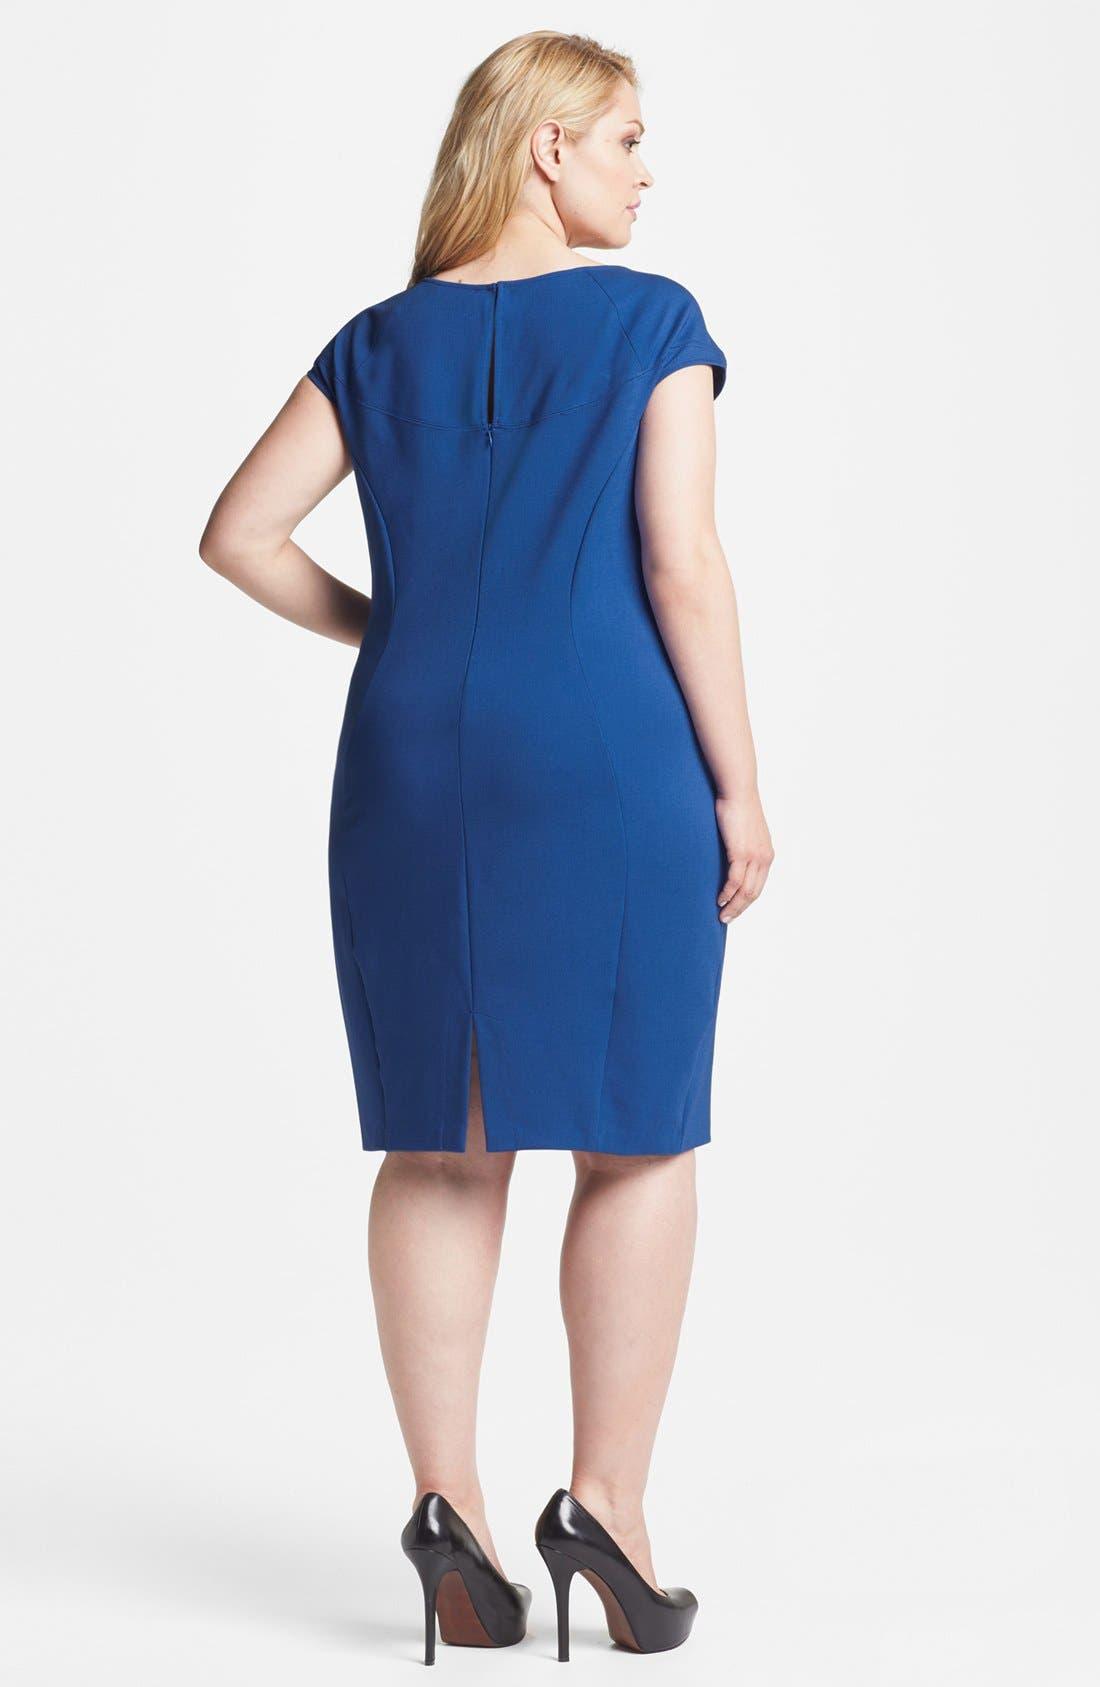 Alternate Image 2  - ABS by Allen Schwartz Fitted Ponte Knit Dress (Plus Size)